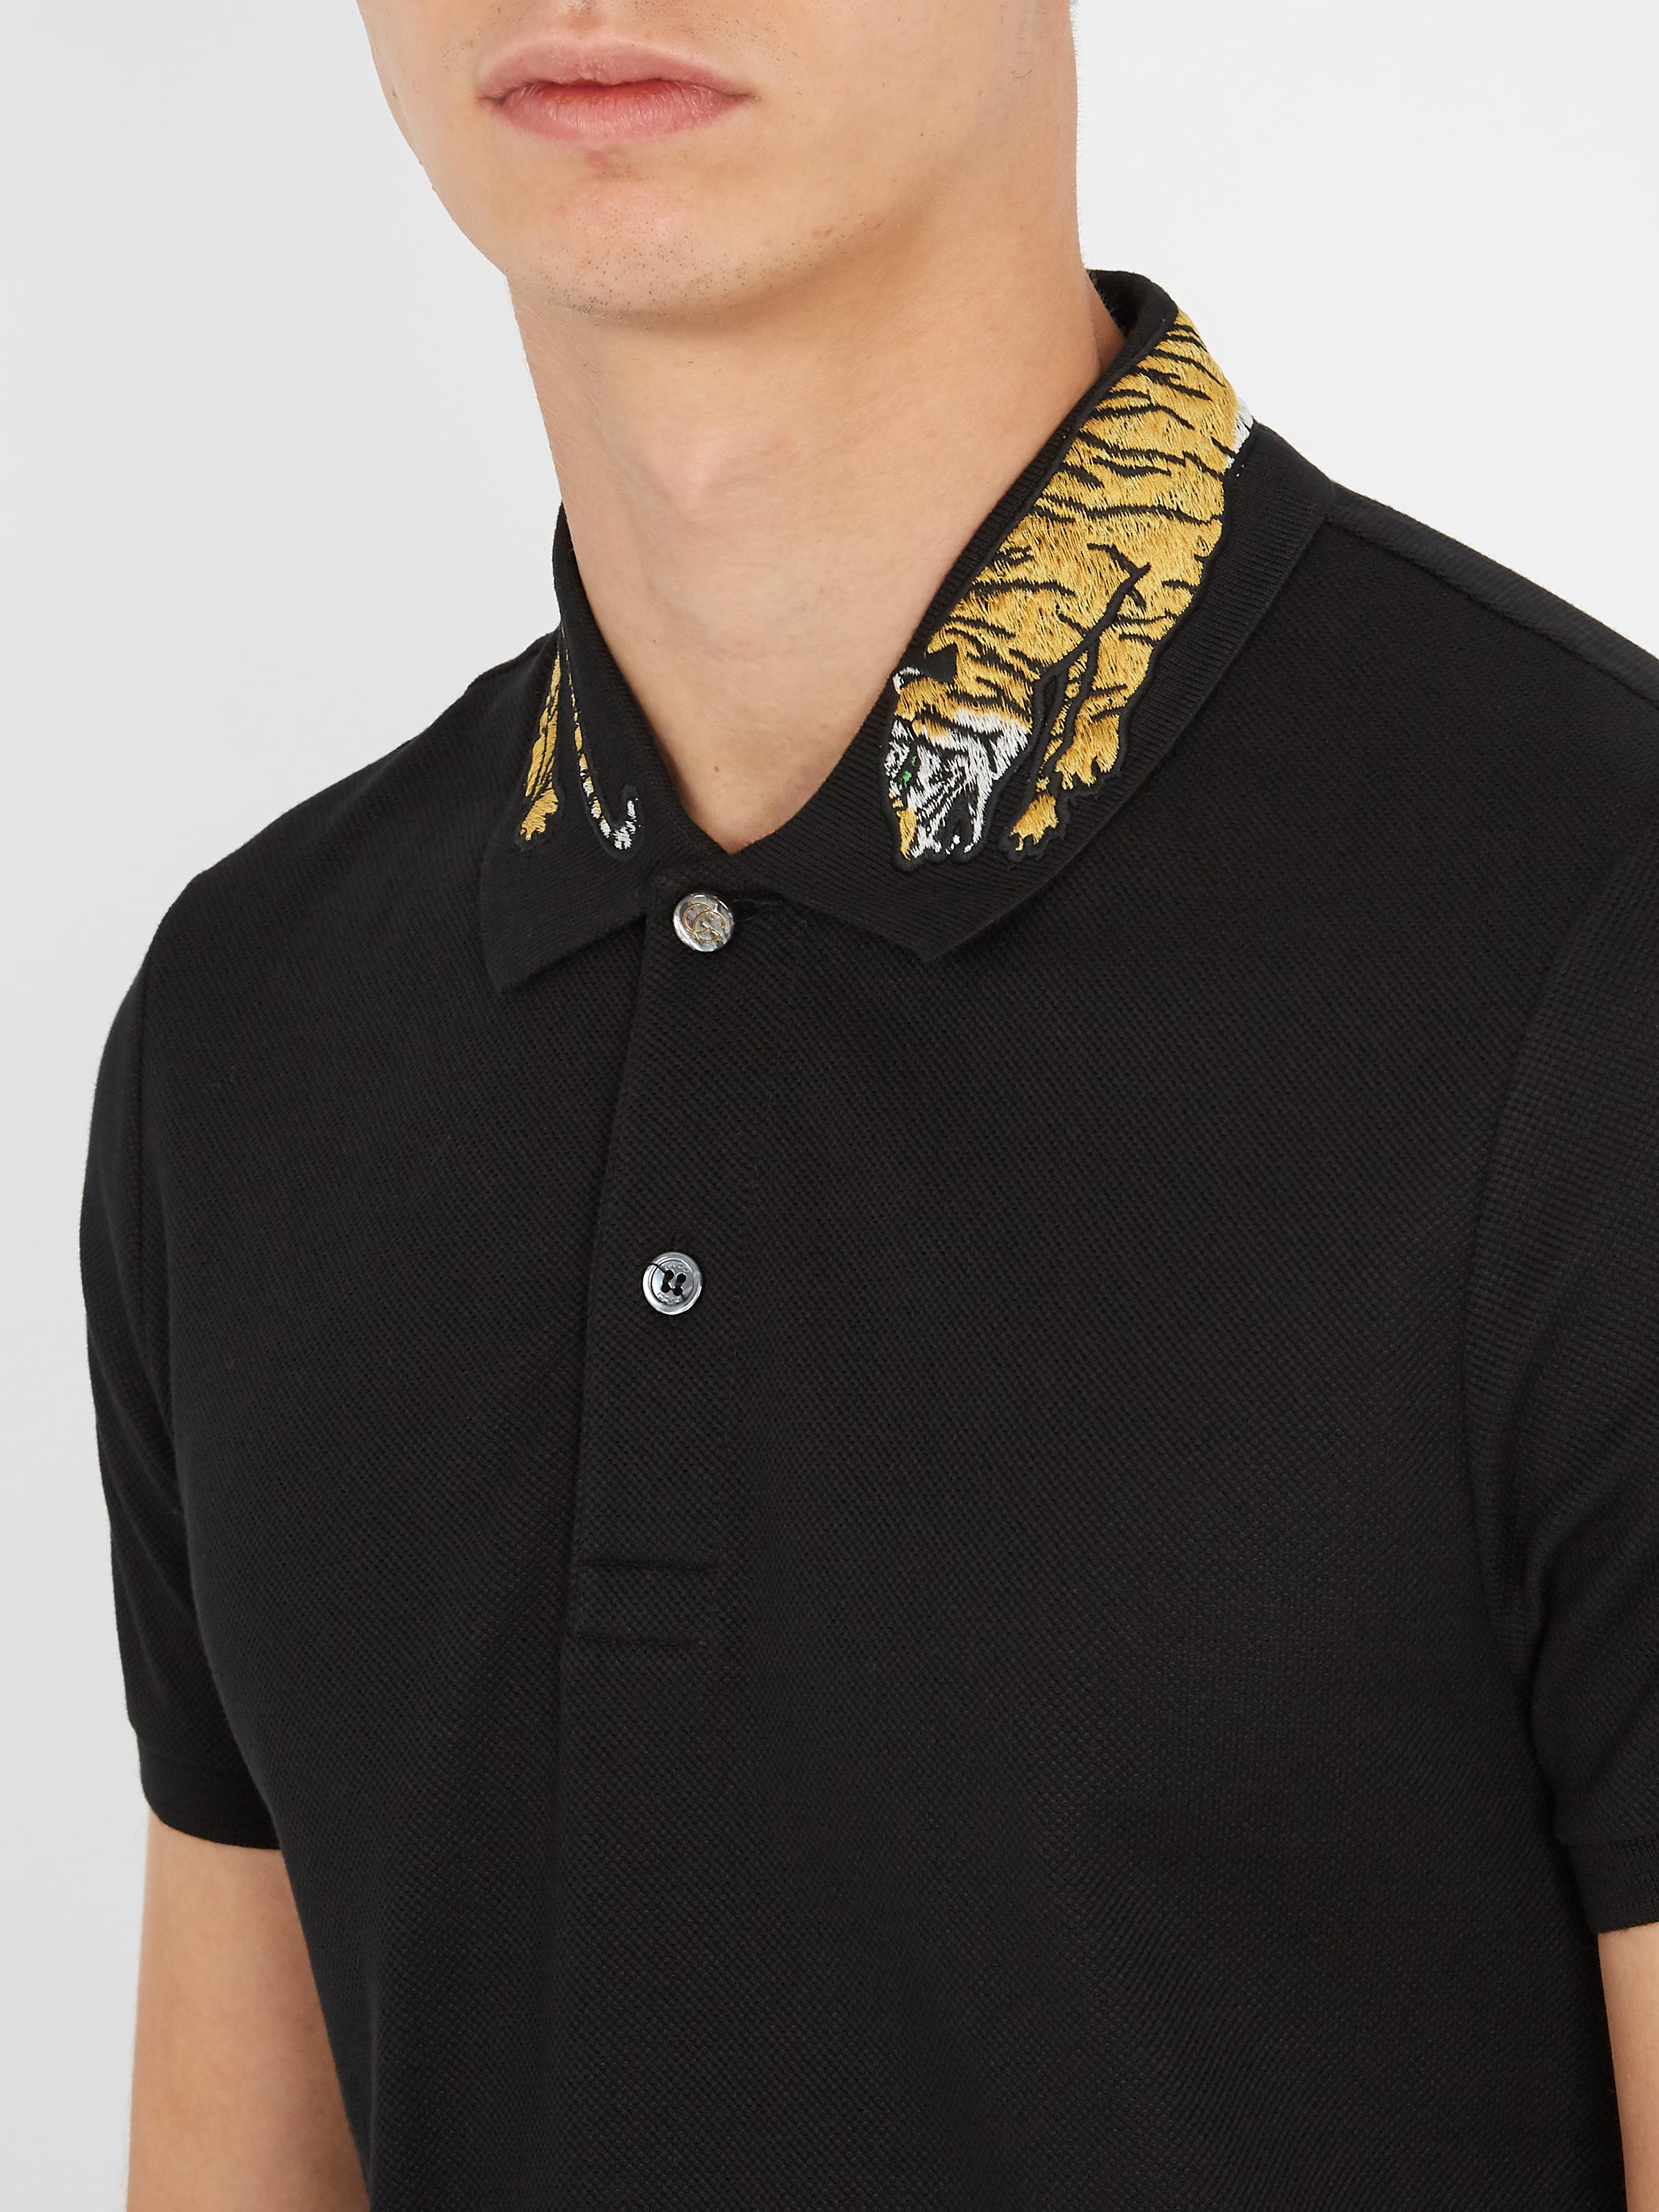 d3ecea6179ebe8 Gucci Tiger-appliqué Cotton-blend Piqué Polo Shirt in Black for Men ...